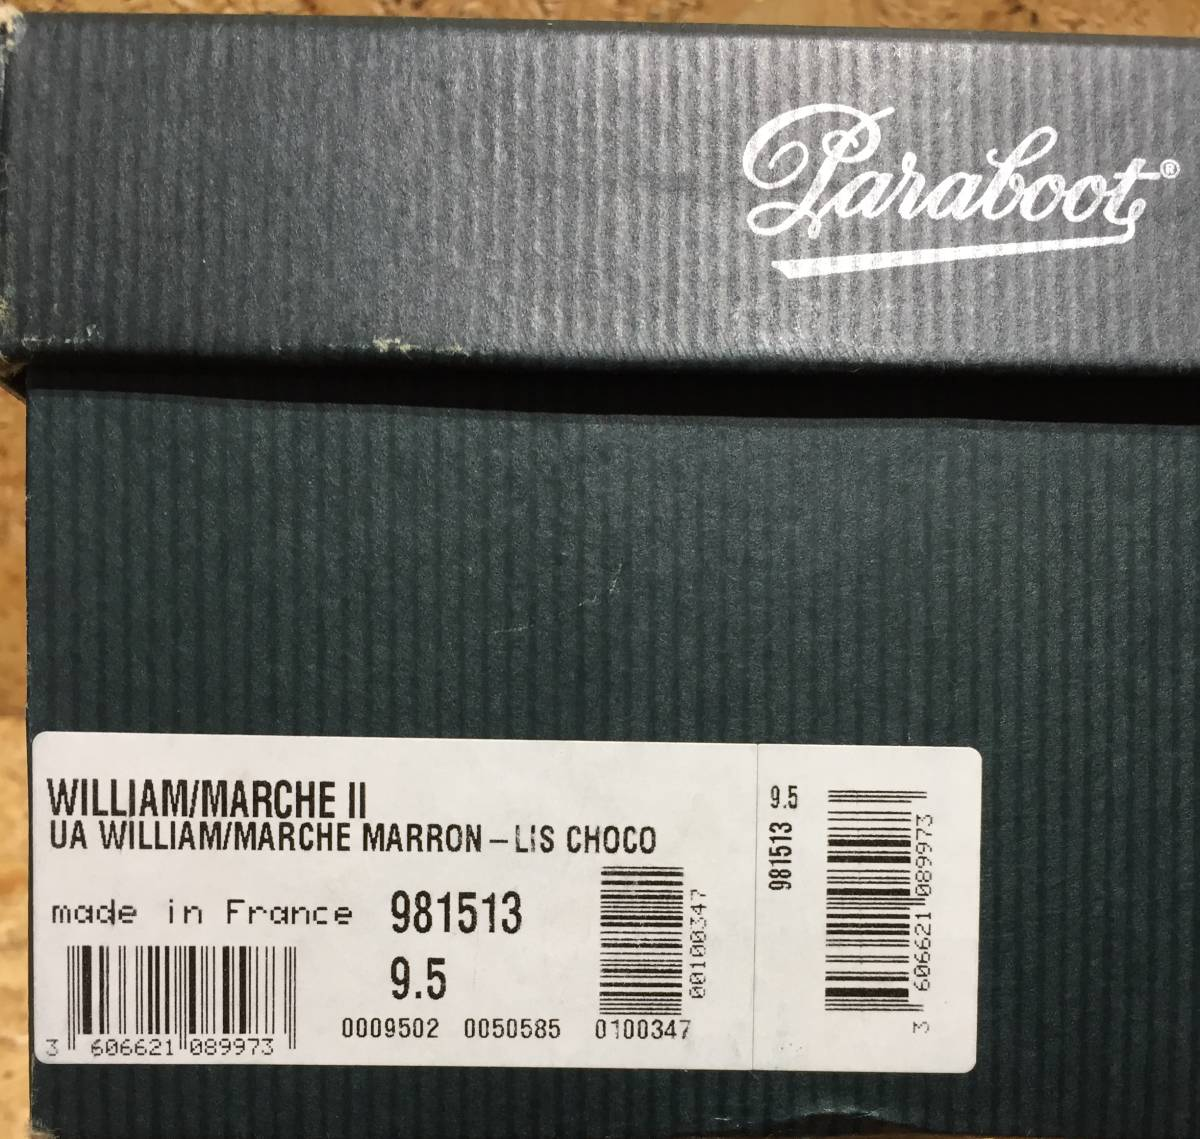 Paraboot UNITED ARROWS WILLIAM ダブル モンク シューズ 9.5 コラボ 別注 限定 ユナイテッド アローズ ウィリアム_画像8